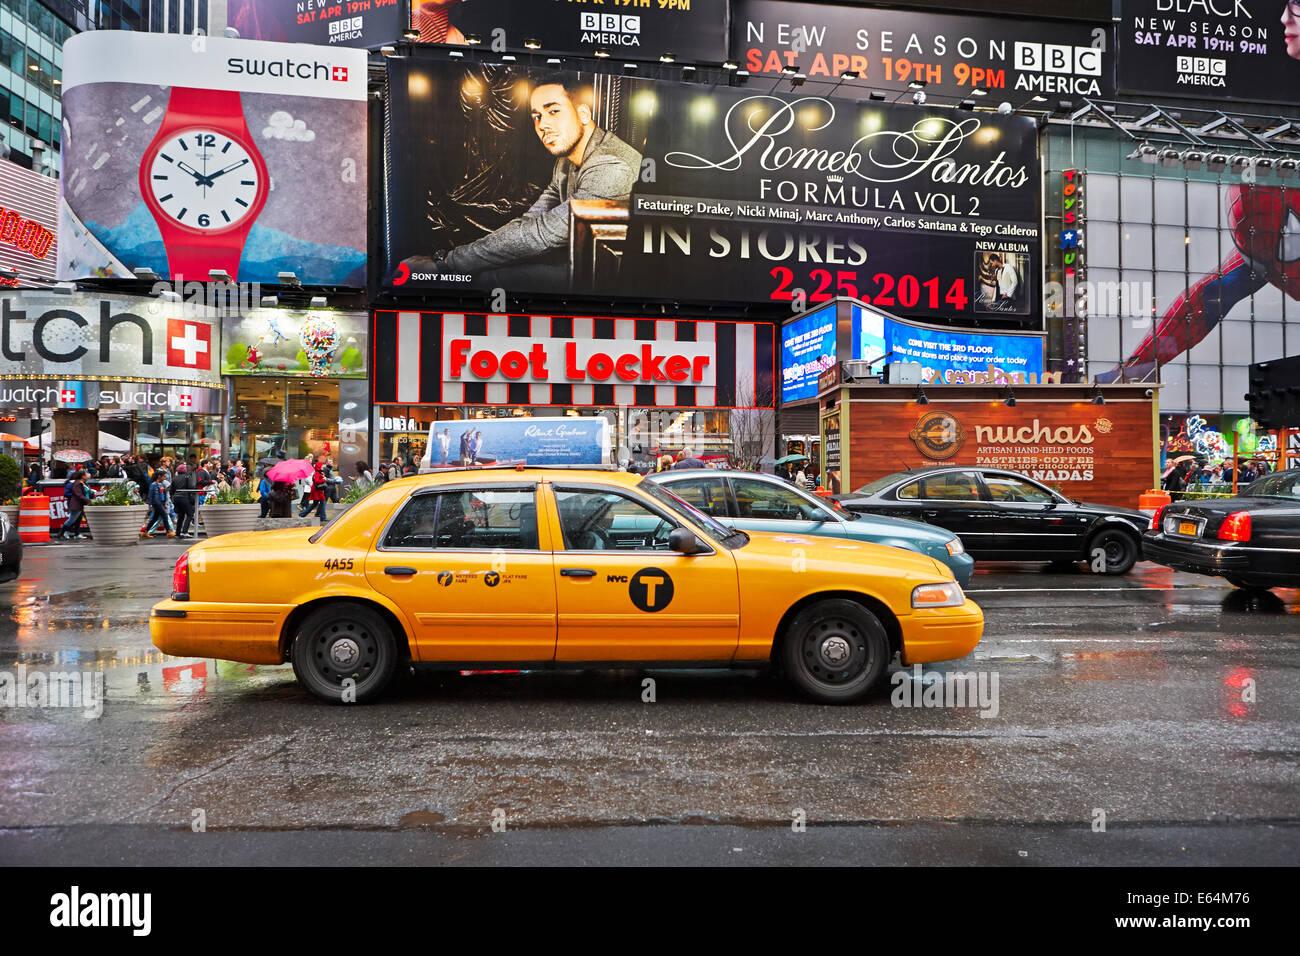 Yellow Medallion taxi on Times Square. Manhattan, New York, USA. - Stock Image